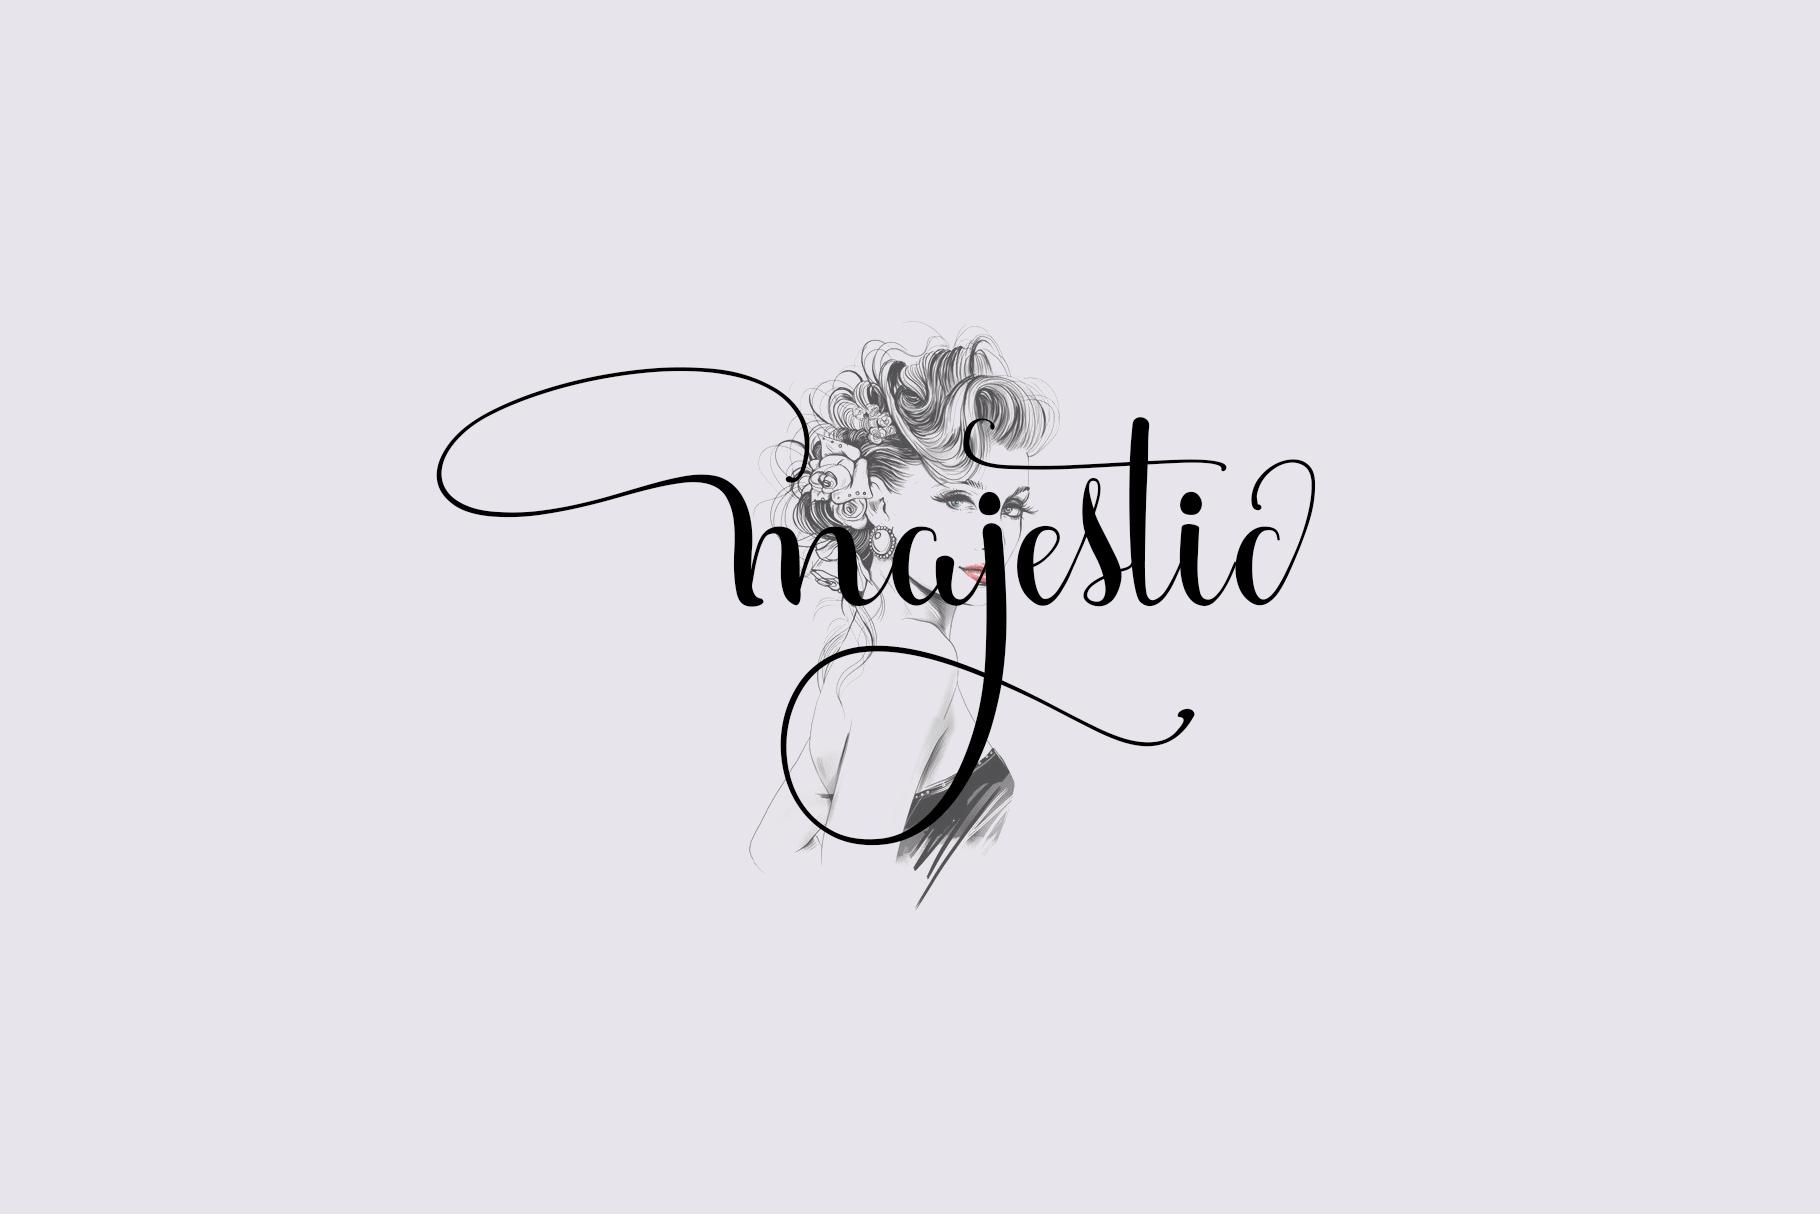 Majestic example image 1